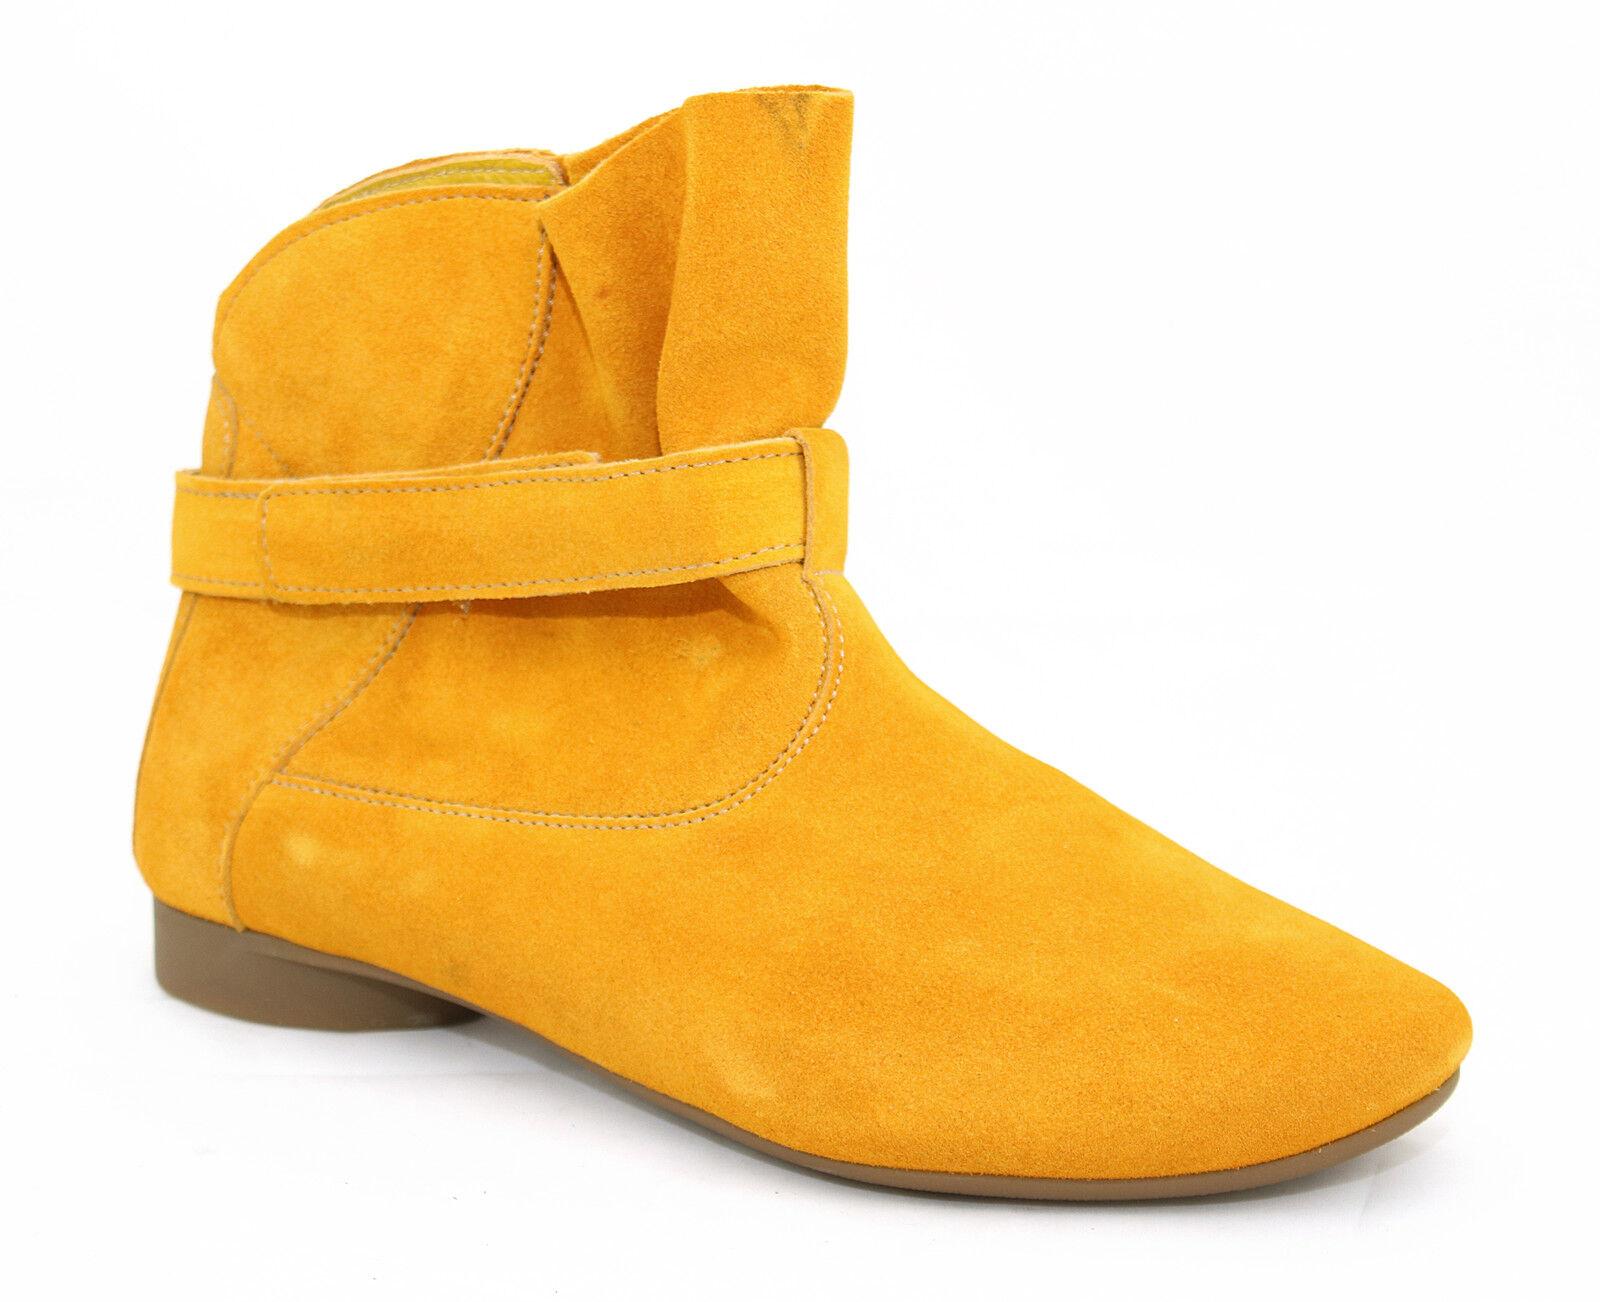 258 think! señora botas botín Guad euvp * 159,90